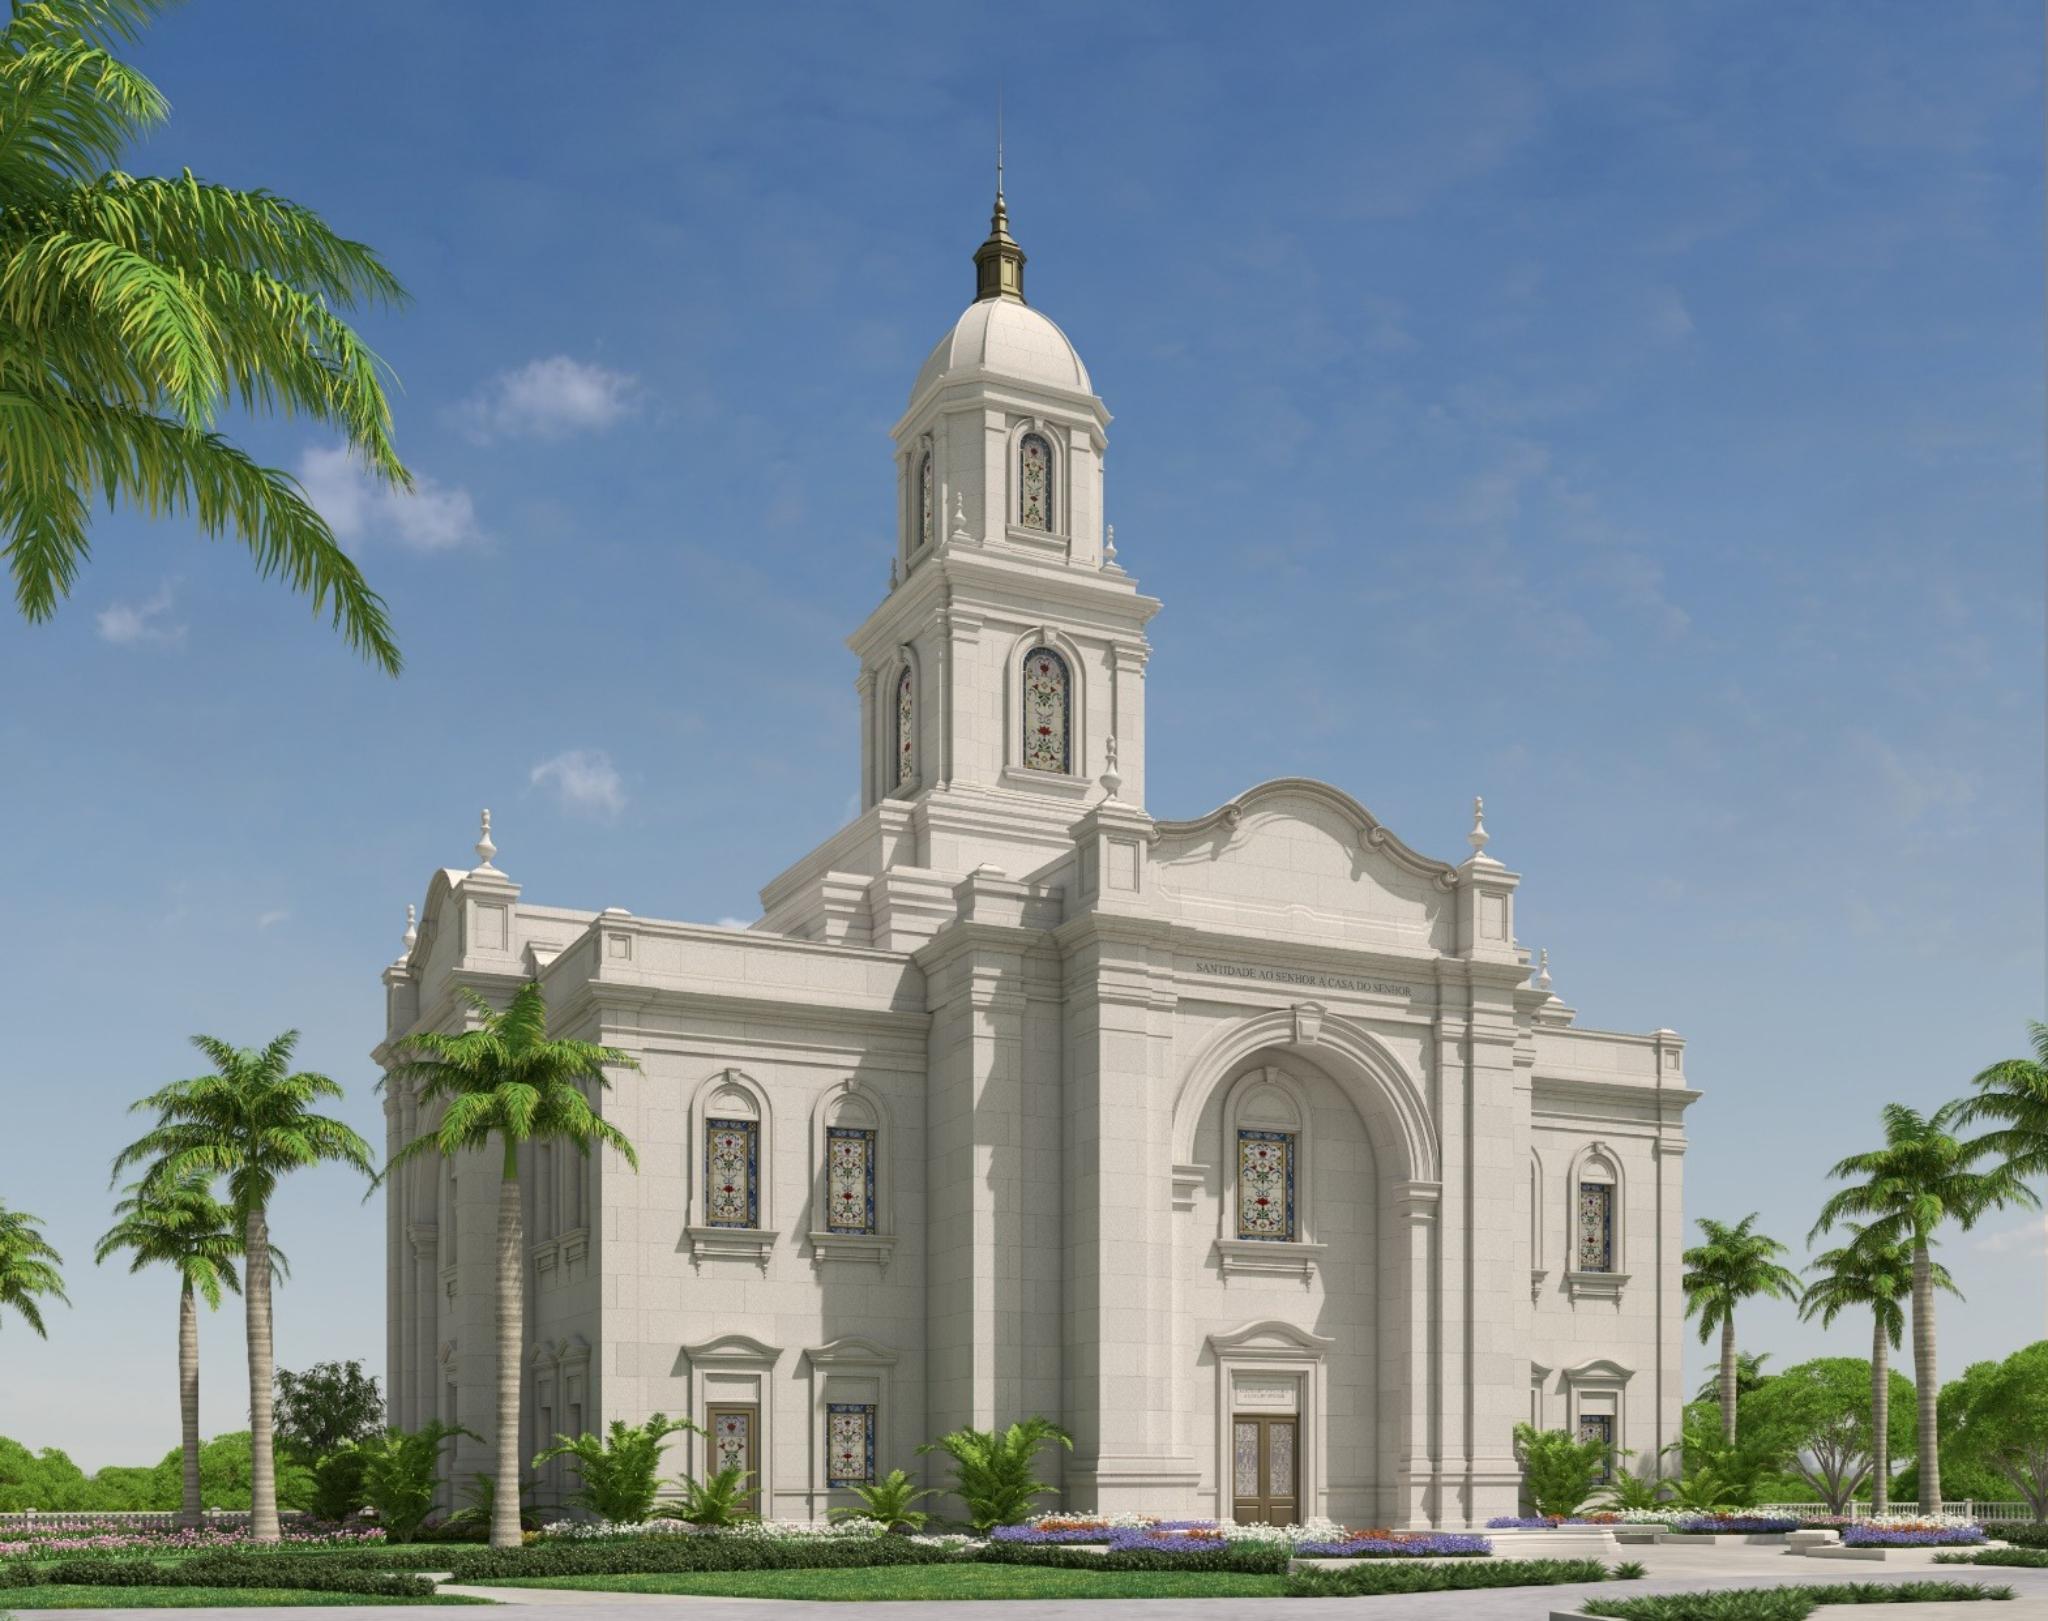 Salvador Brazil Temple Rendering | Intellectual Reserve